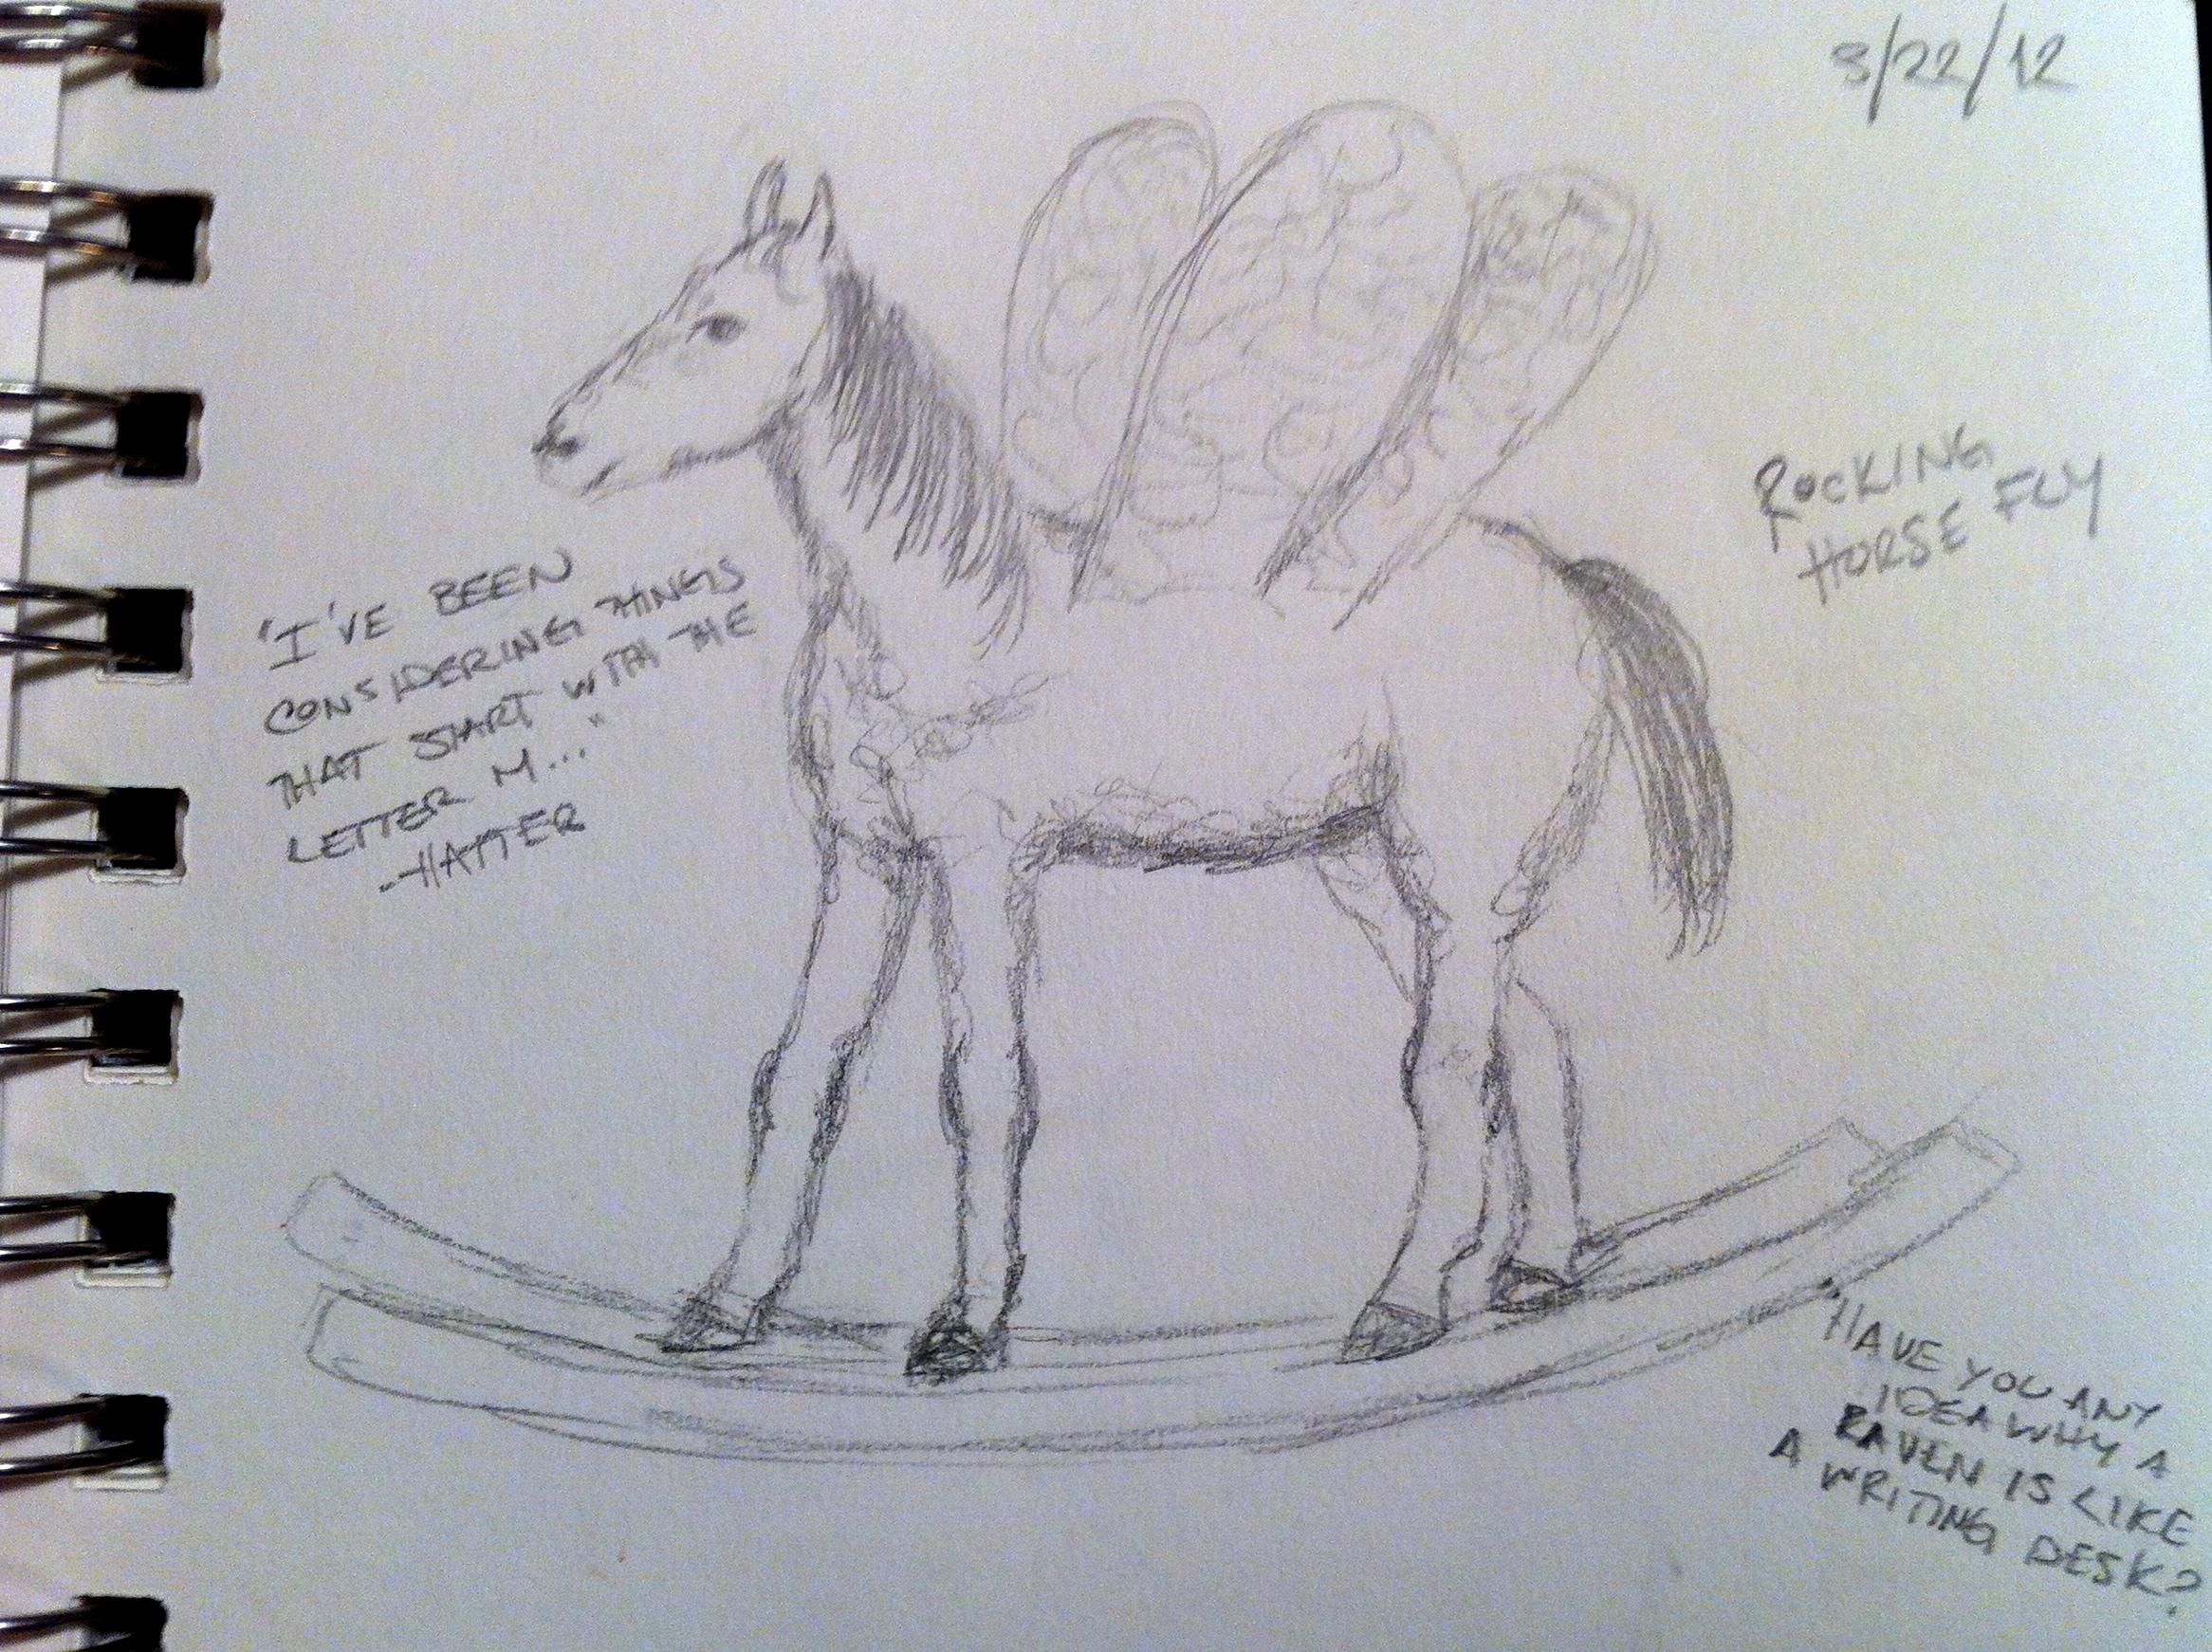 Rocking Horsefly